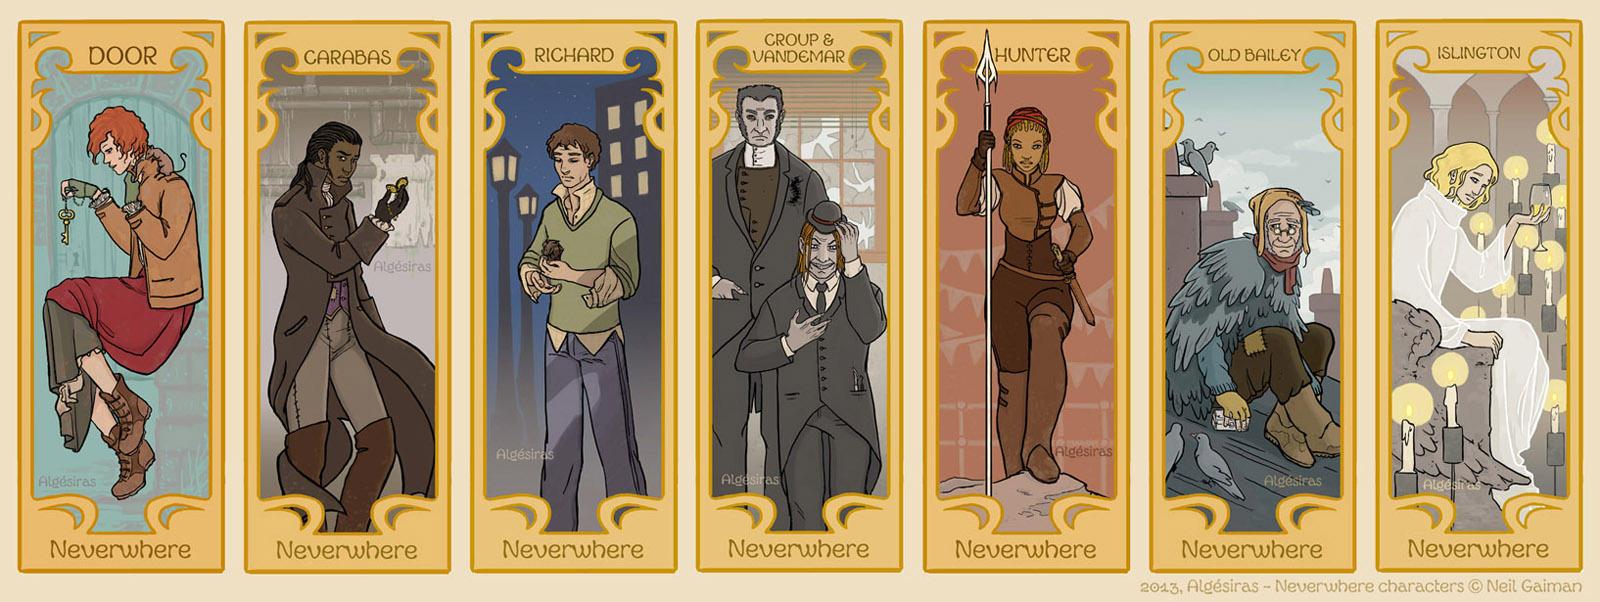 Neverwhere Characters by Algesiras